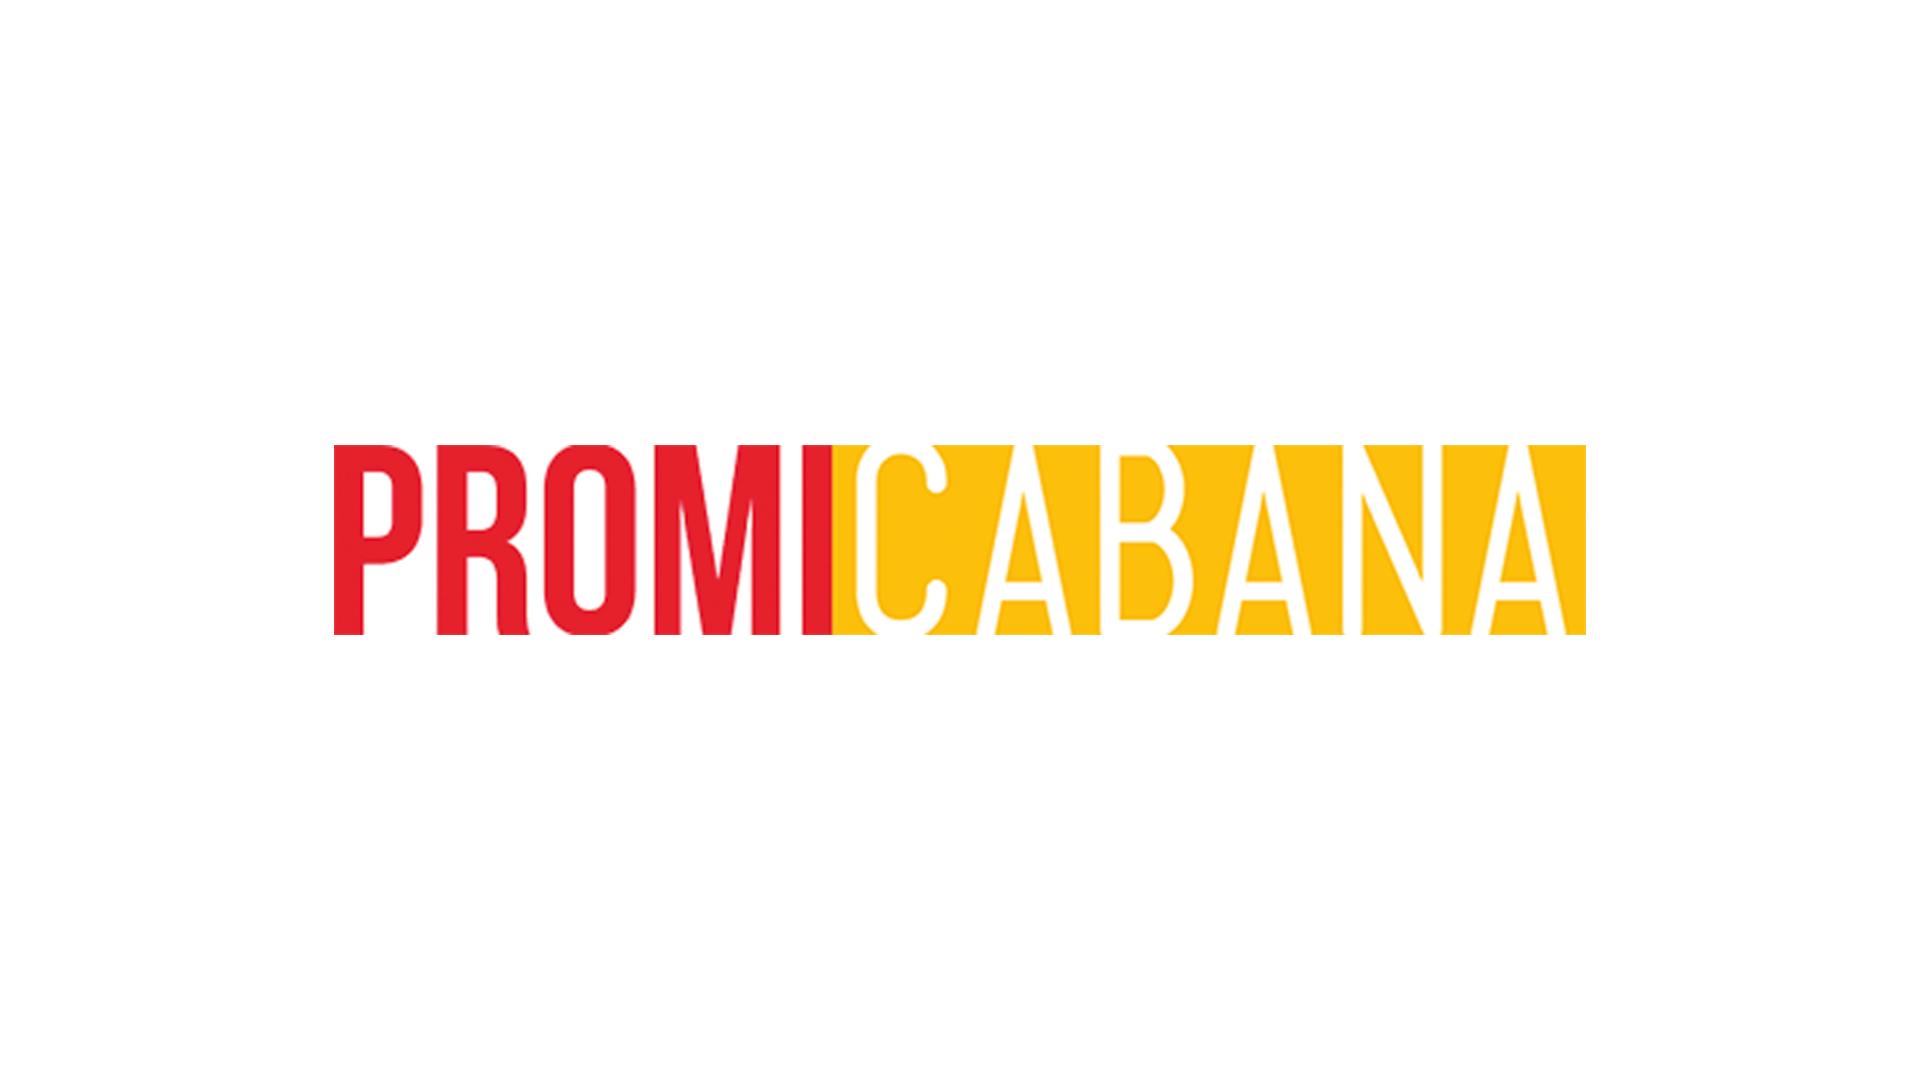 Christina-Grimmie-Snow-White-Musikvideo-2